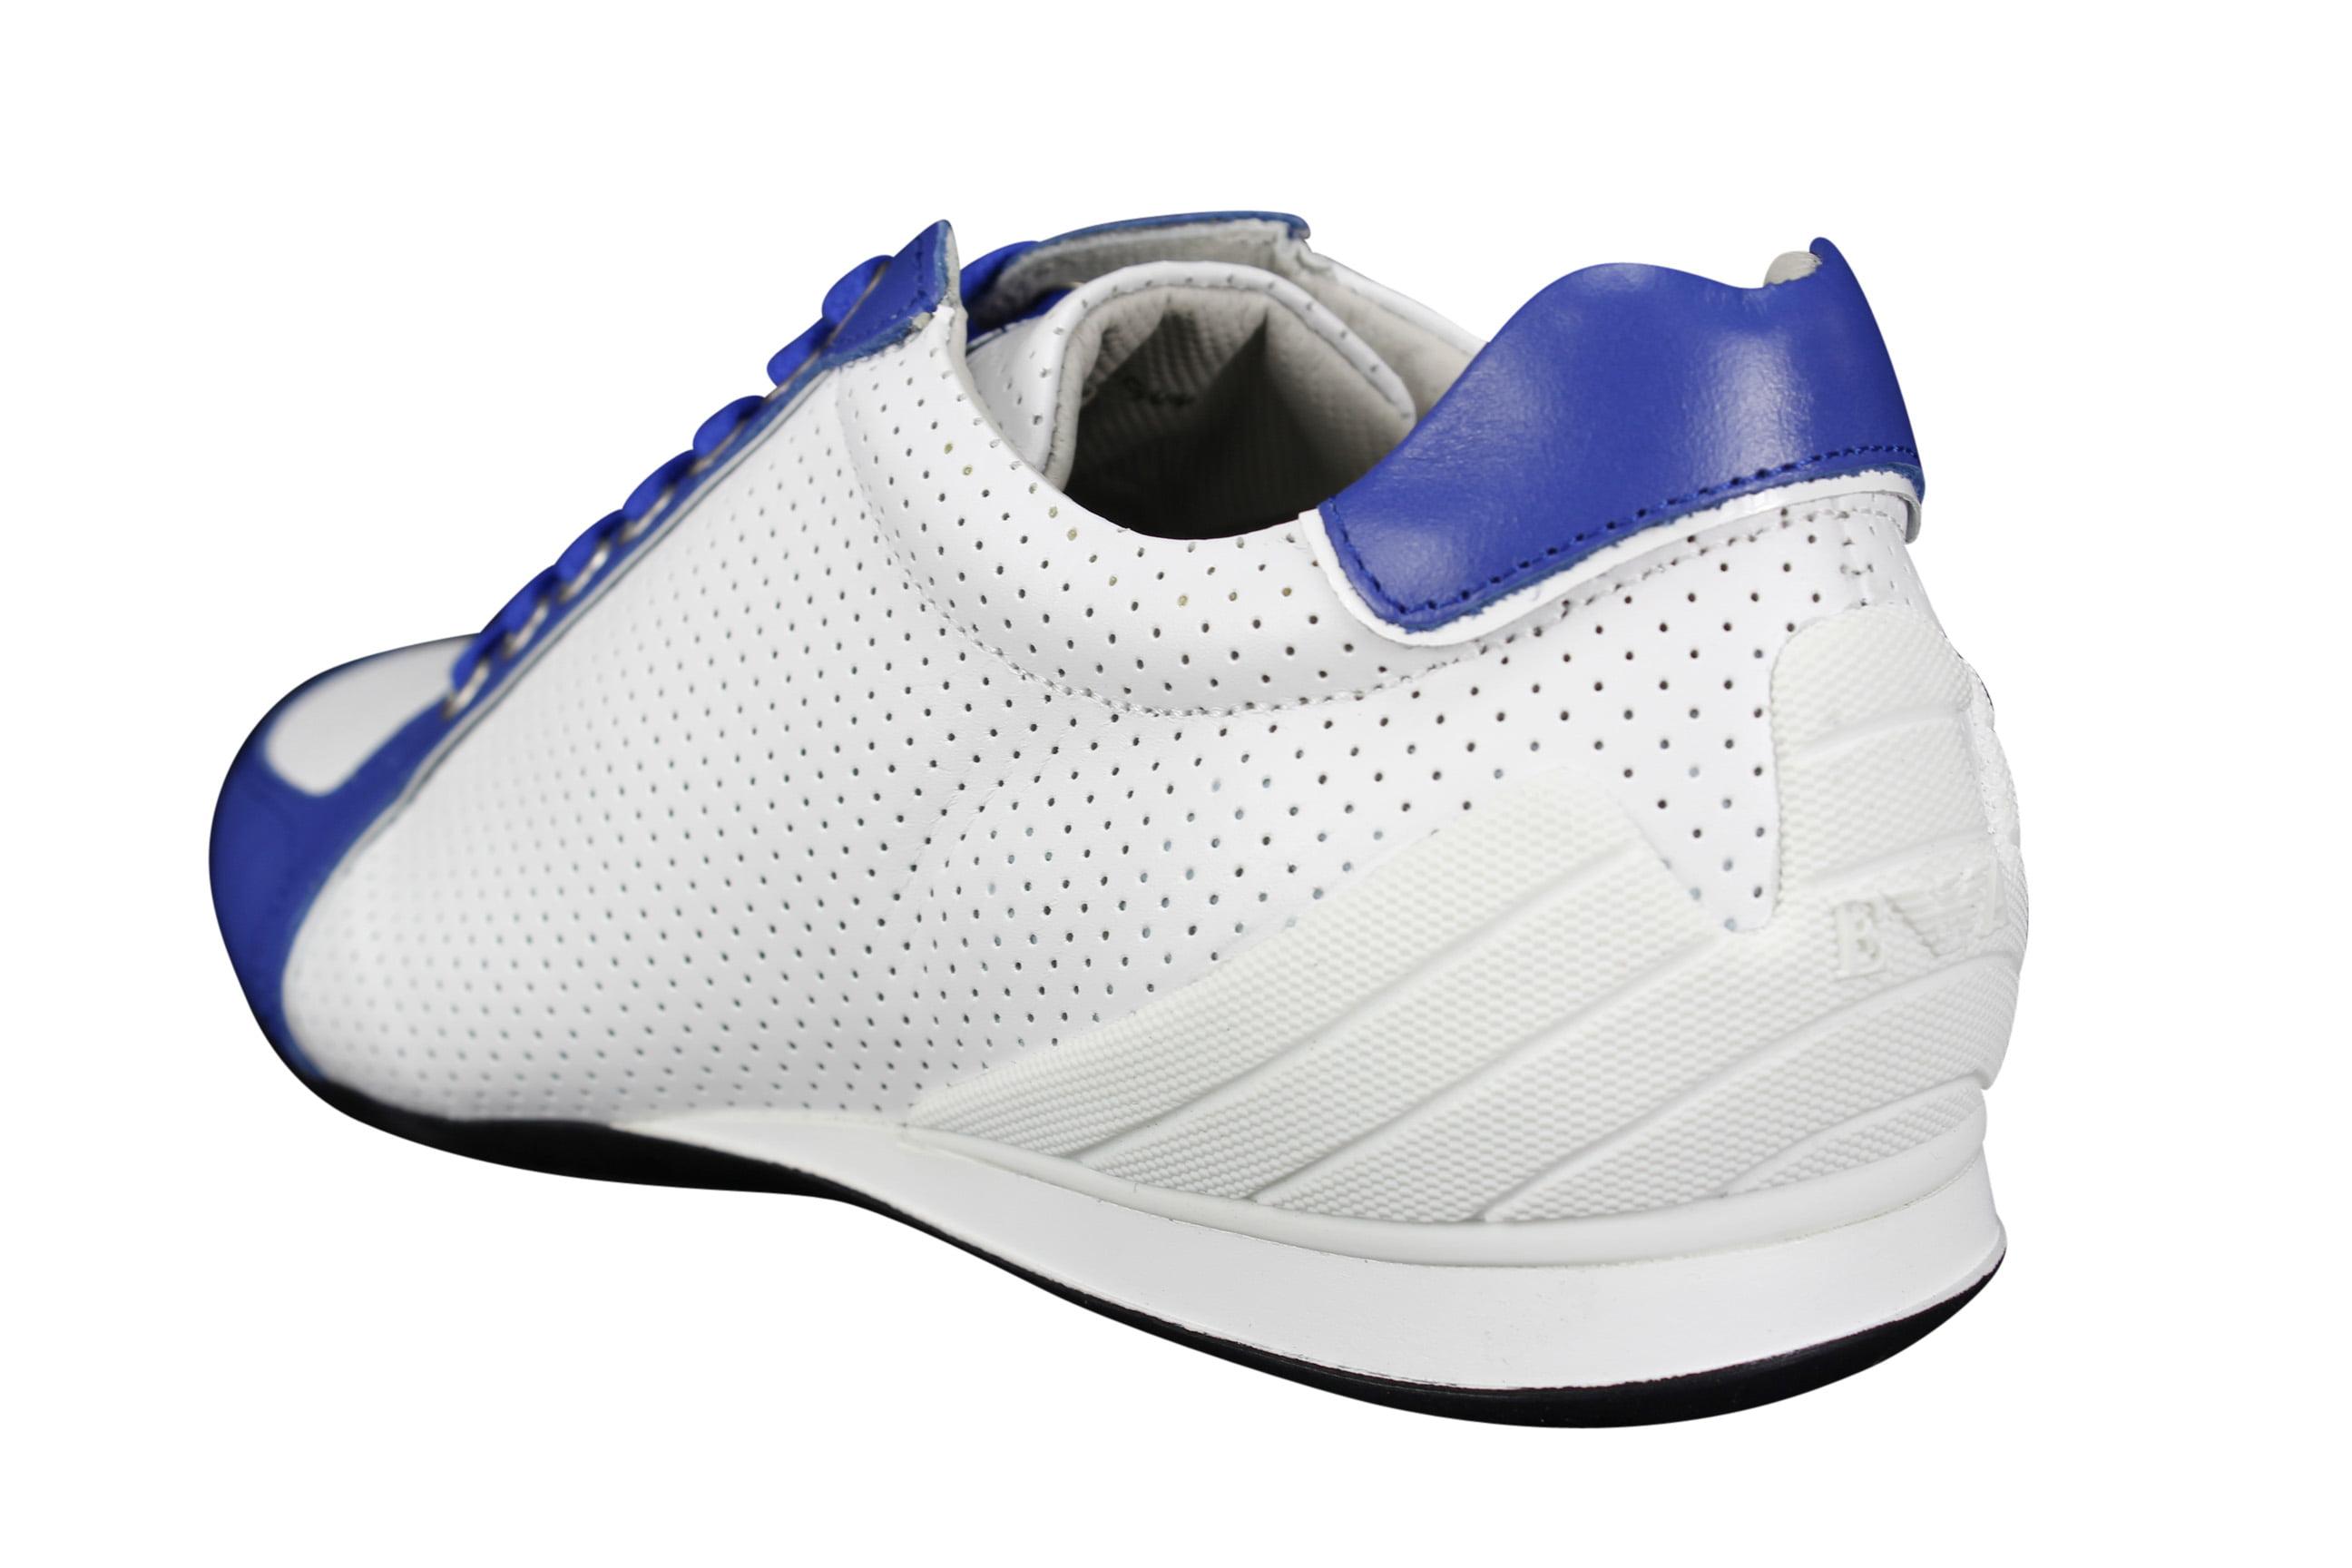 Emporio Armani Mens Sneakers Size 5 US White Calf Leather